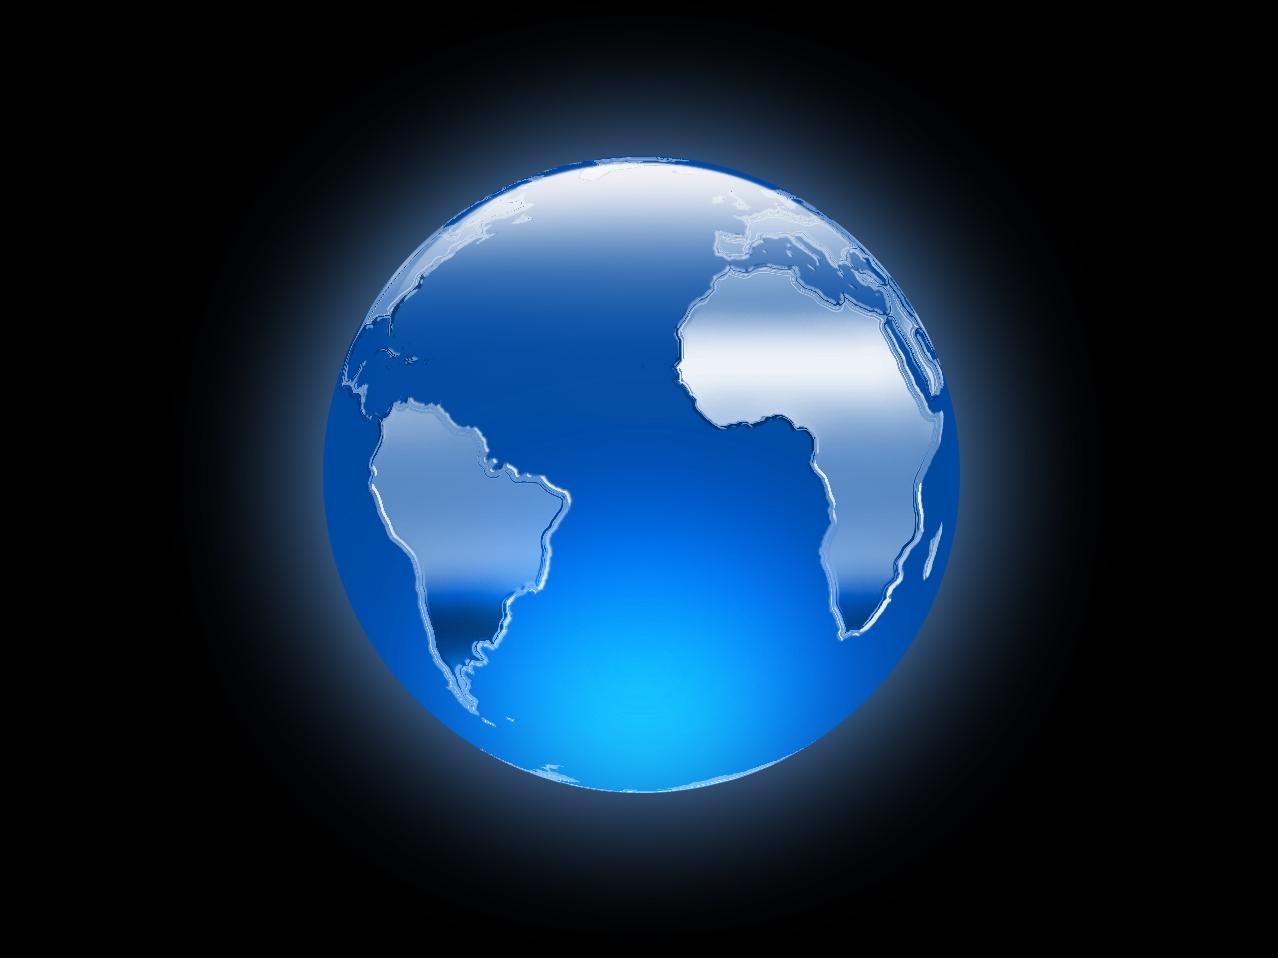 http://2.bp.blogspot.com/-CIjuT3B2qEQ/Te-applietI/AAAAAAAABXo/H-9j1vbtRqE/s1600/Planeta+Terra+azul.jpg